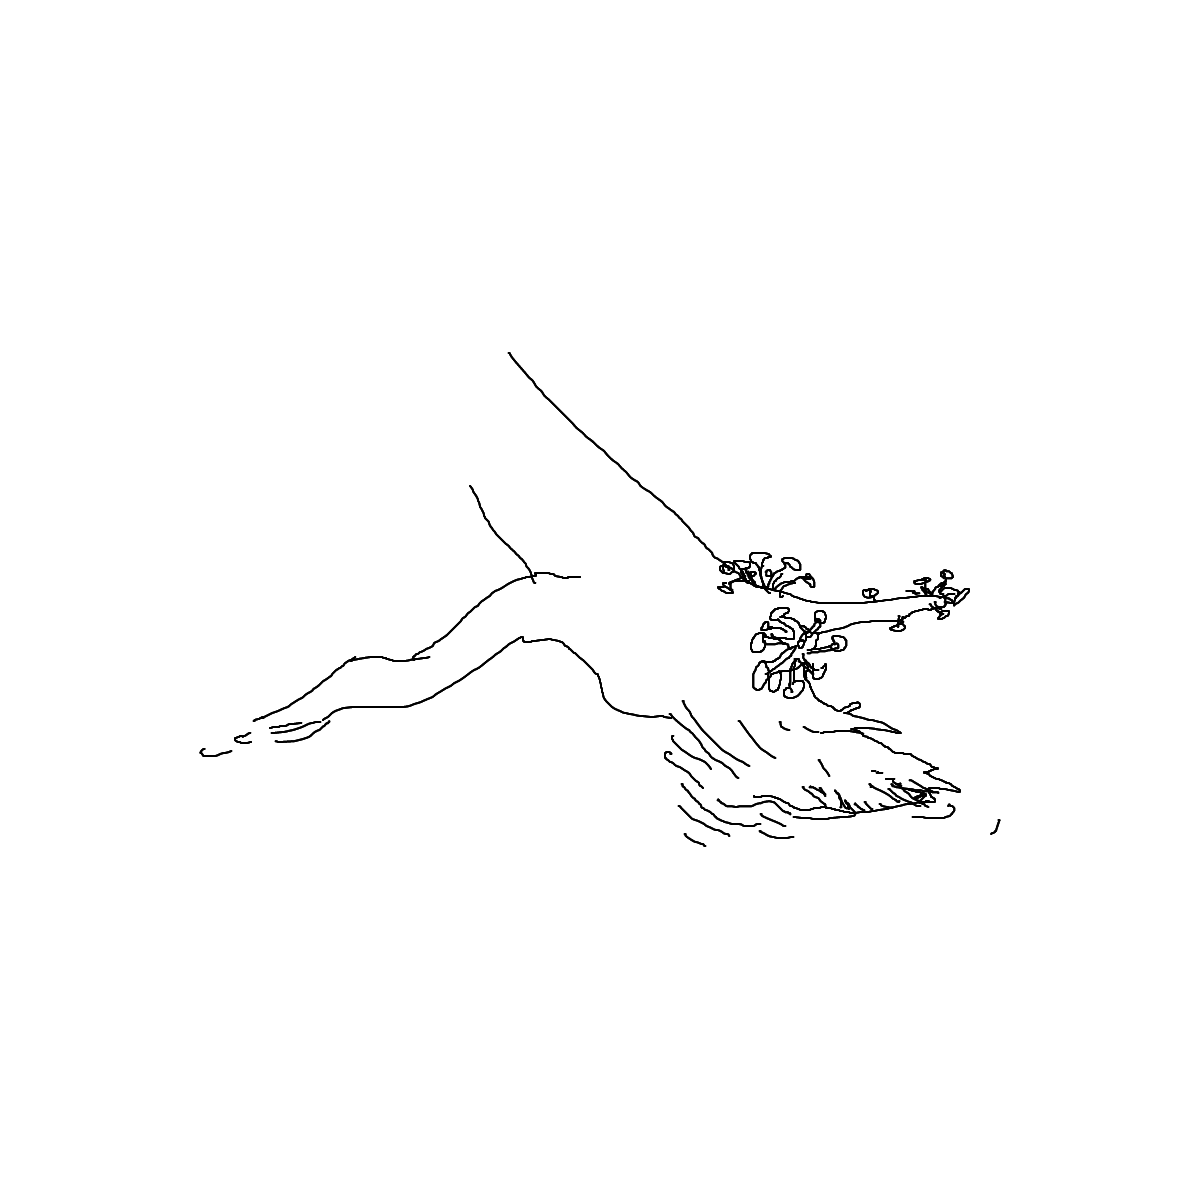 BAAAM drawing#8670 lat:78.4203186035156200lng: -4.4838137626647950